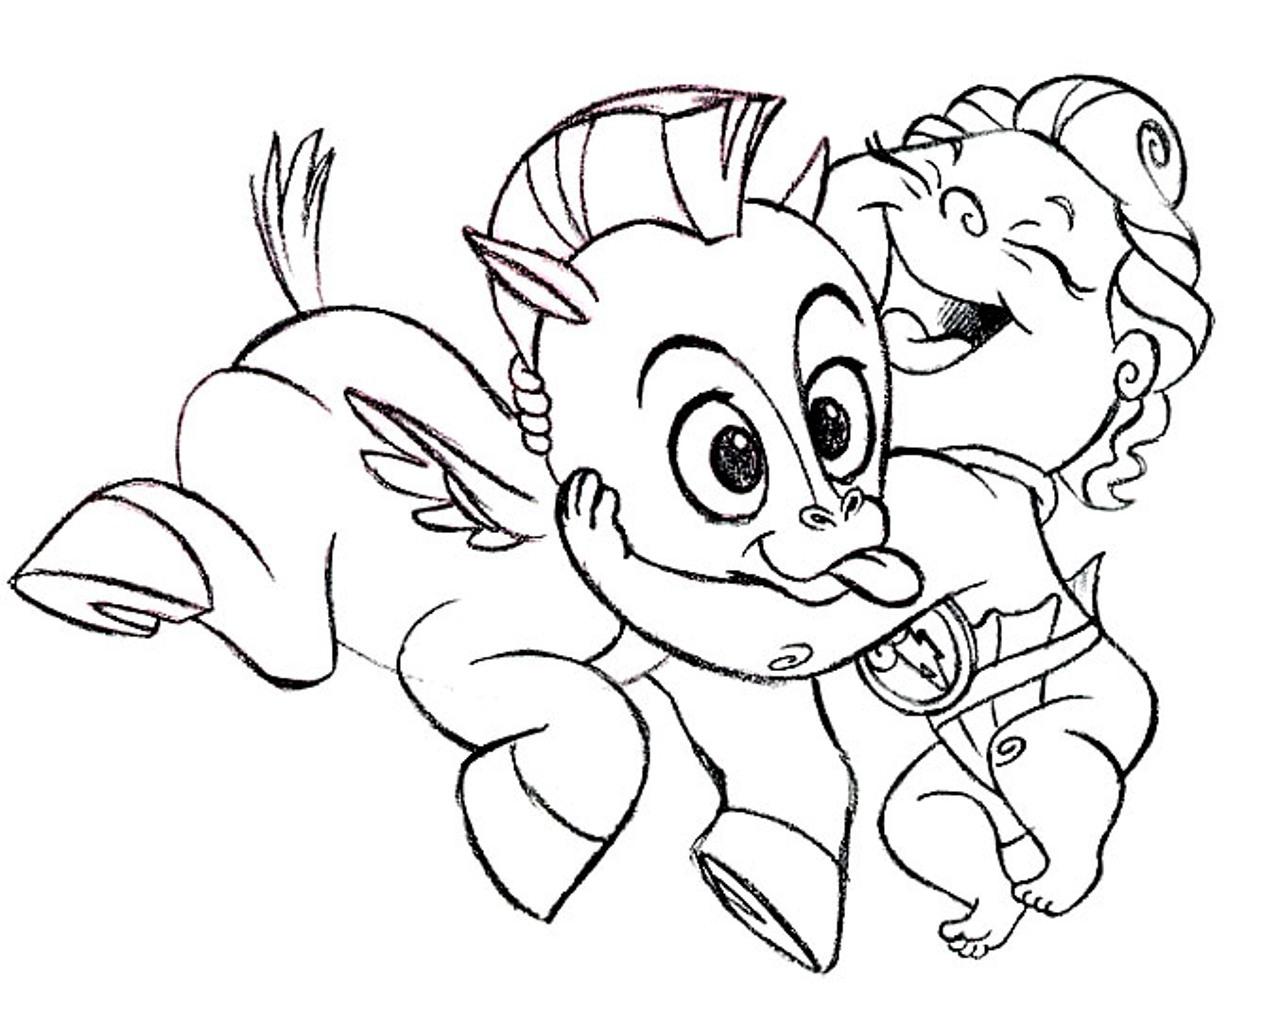 Hercules - Hercules and Hydra Coloring Page | Disney LOL | 1015x1261